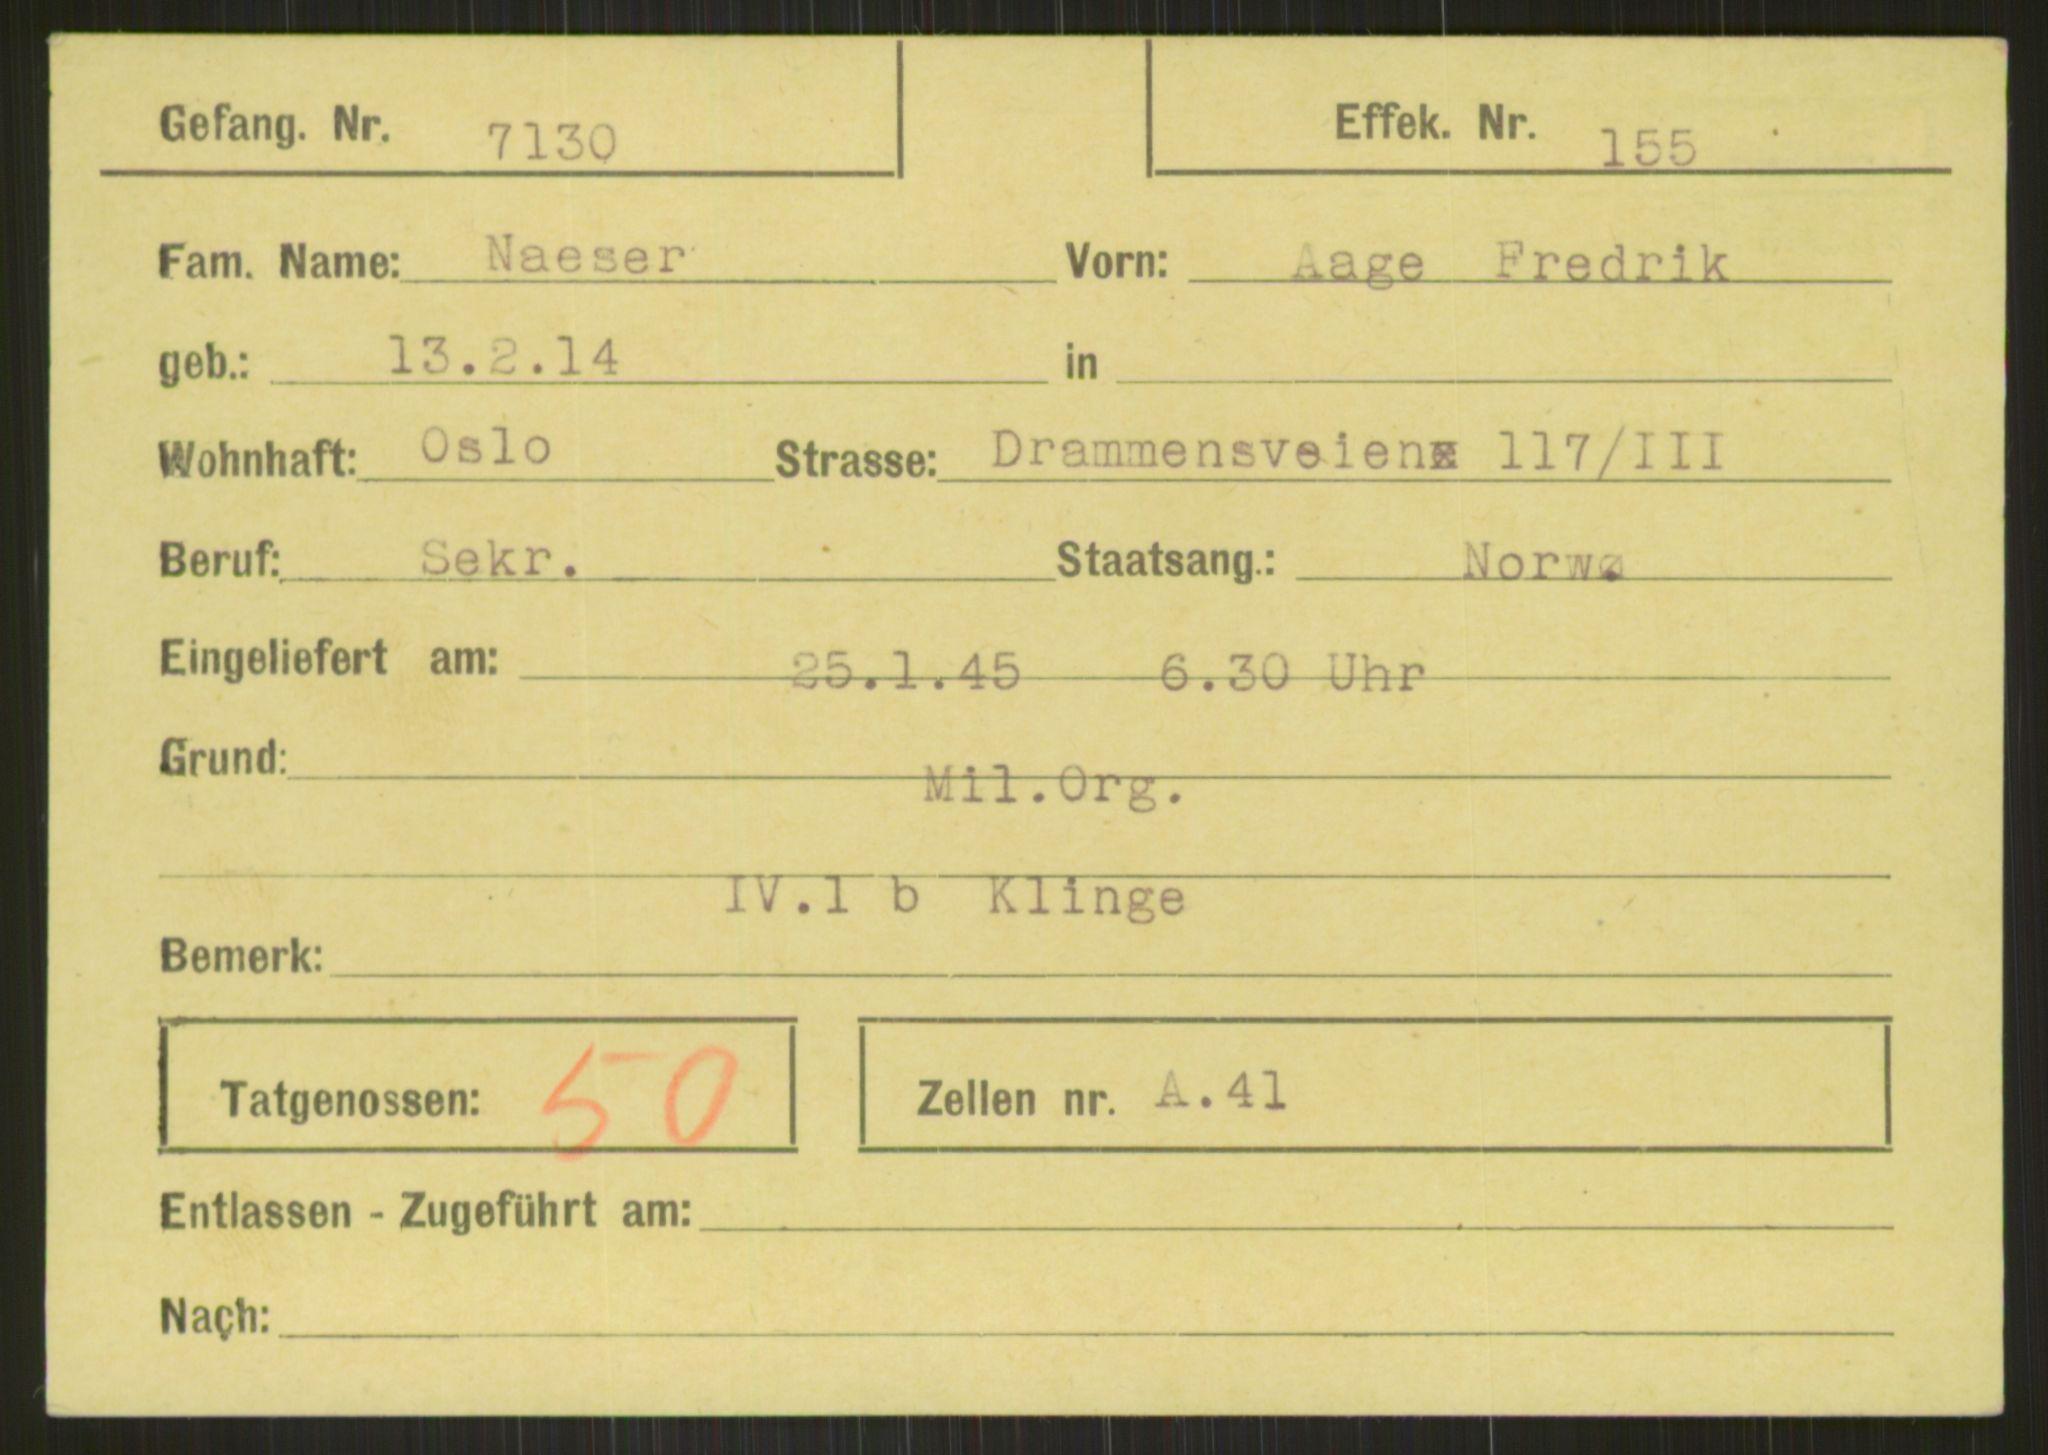 RA, Befehlshaber der Sicherheitspolizei und des SD, E/Ea/Eab/L0008: Register over norske fanger i Møllergata 19 ordnet etter fangenummer: 7130-7531 + 7474, 1940-1945